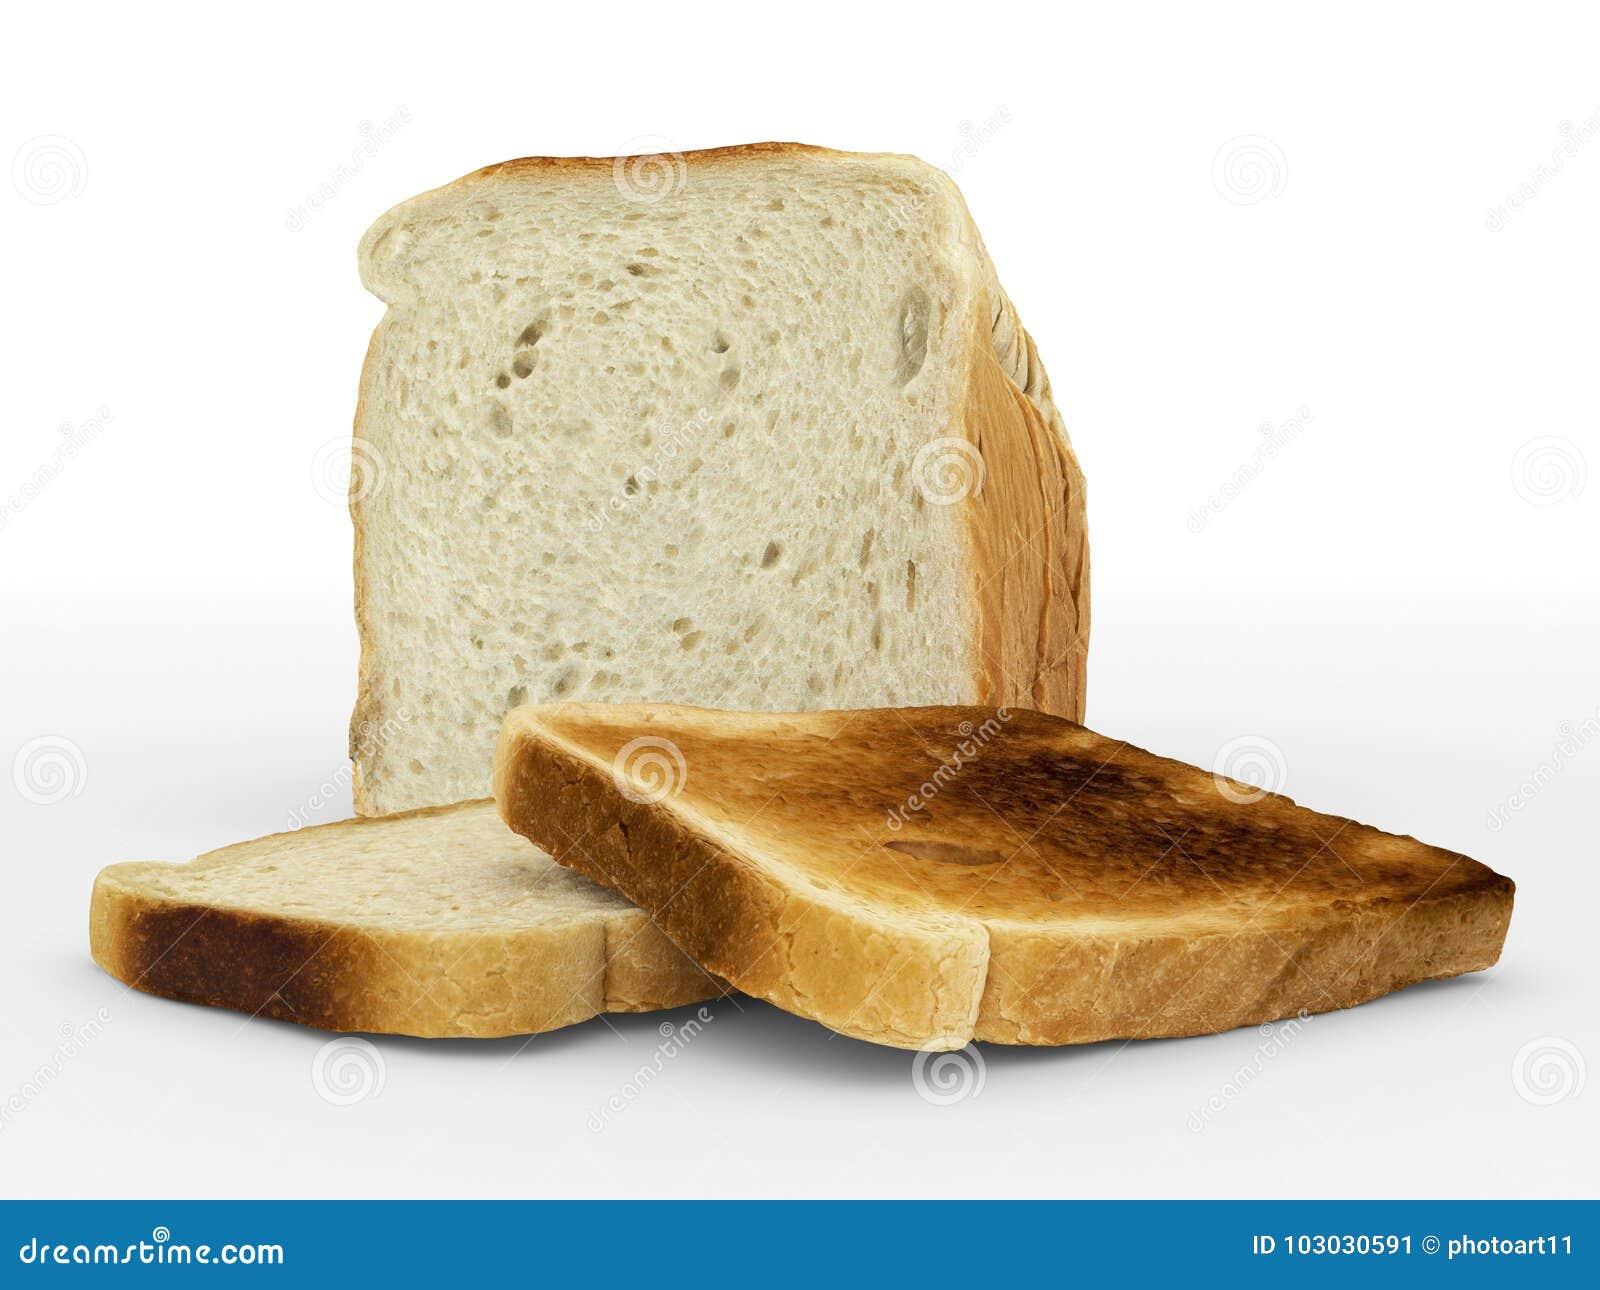 Bread sliced - toast - arrangement on white